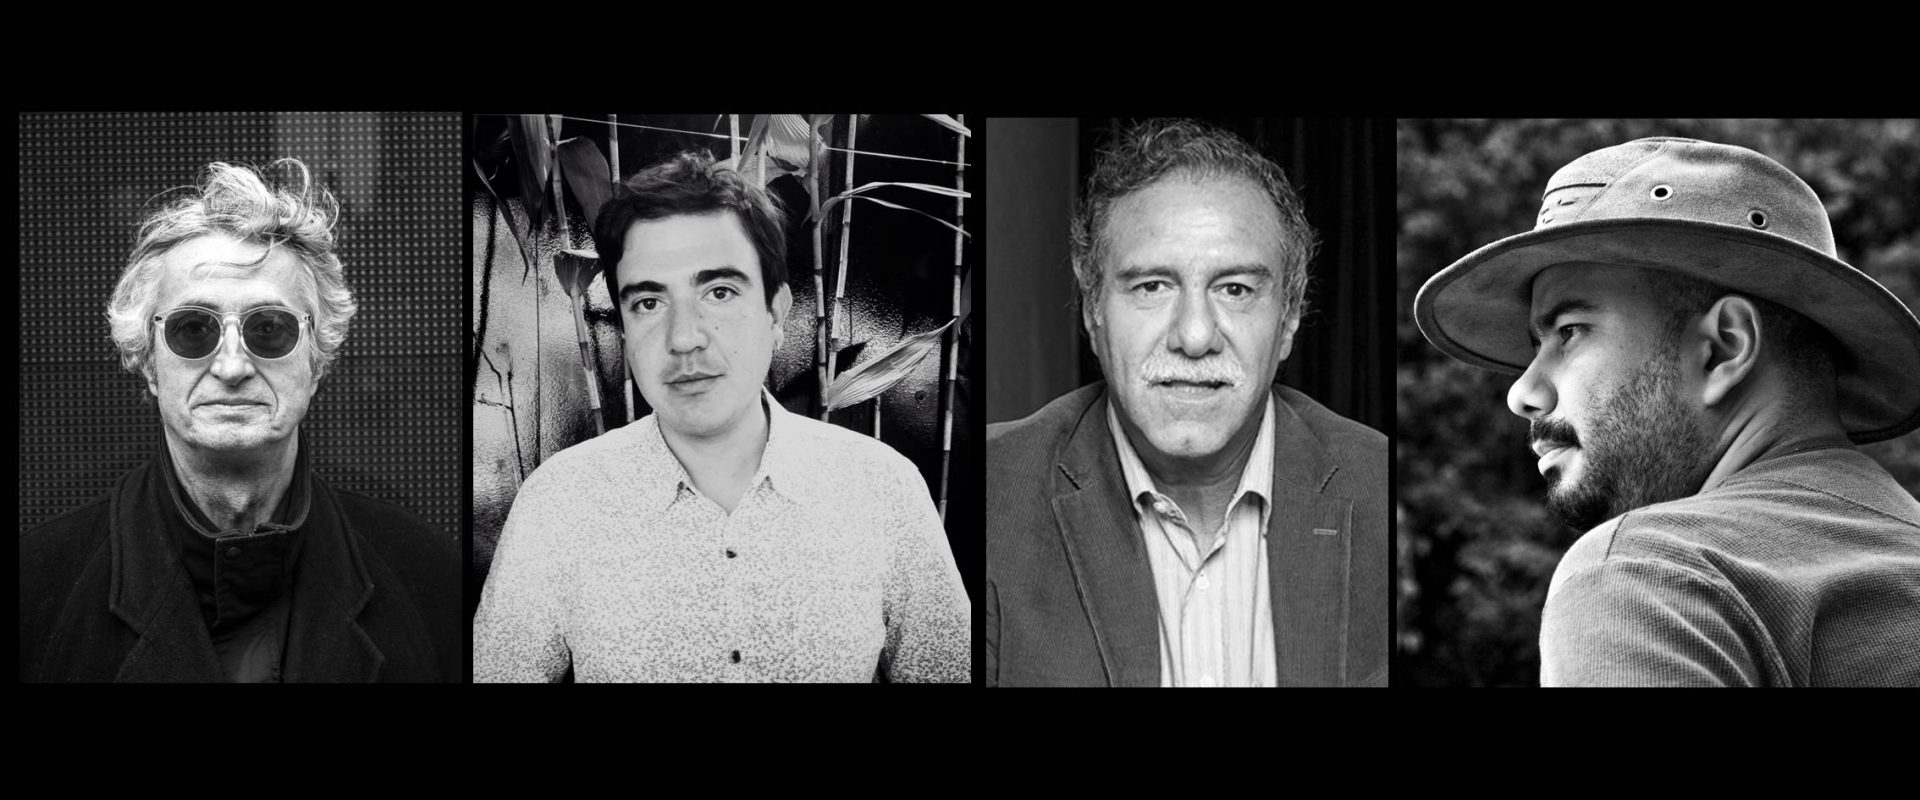 Luis Ospina, Oscar Ruíz Navia, Víctor Gaviria,  et Ciro Guerra présents à Biarritz !